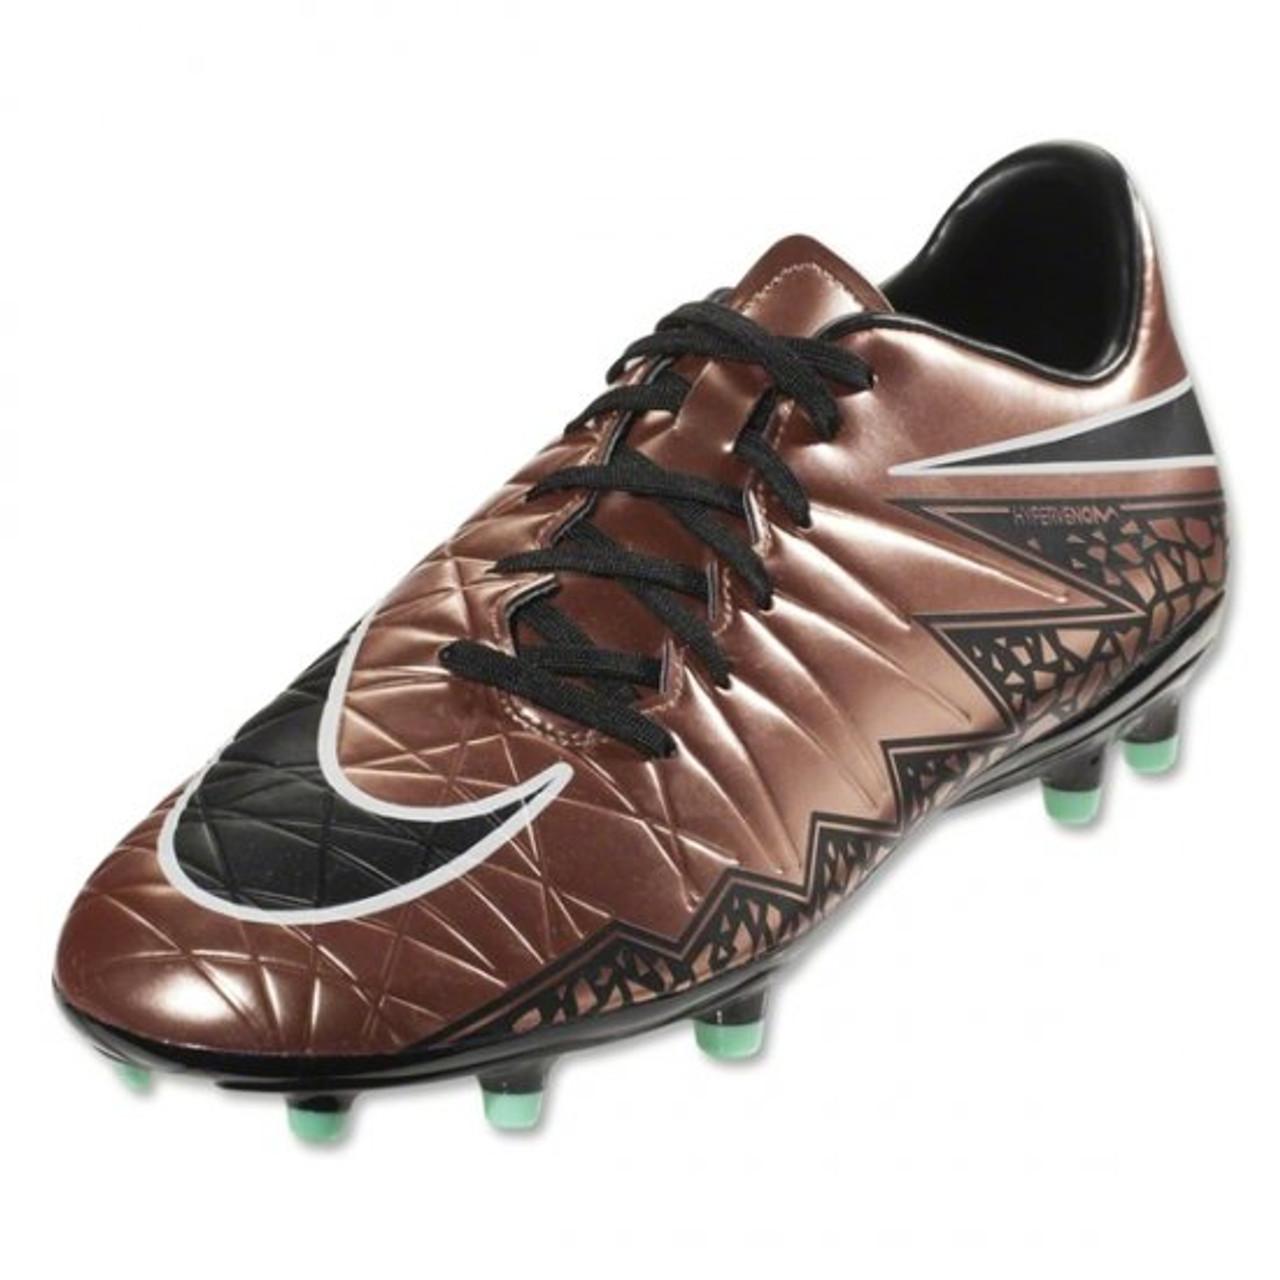 3b07c28906d7 Nike Hypervenom Phelon II FG - Metallic Red Brown/Green/Black/Glow ...